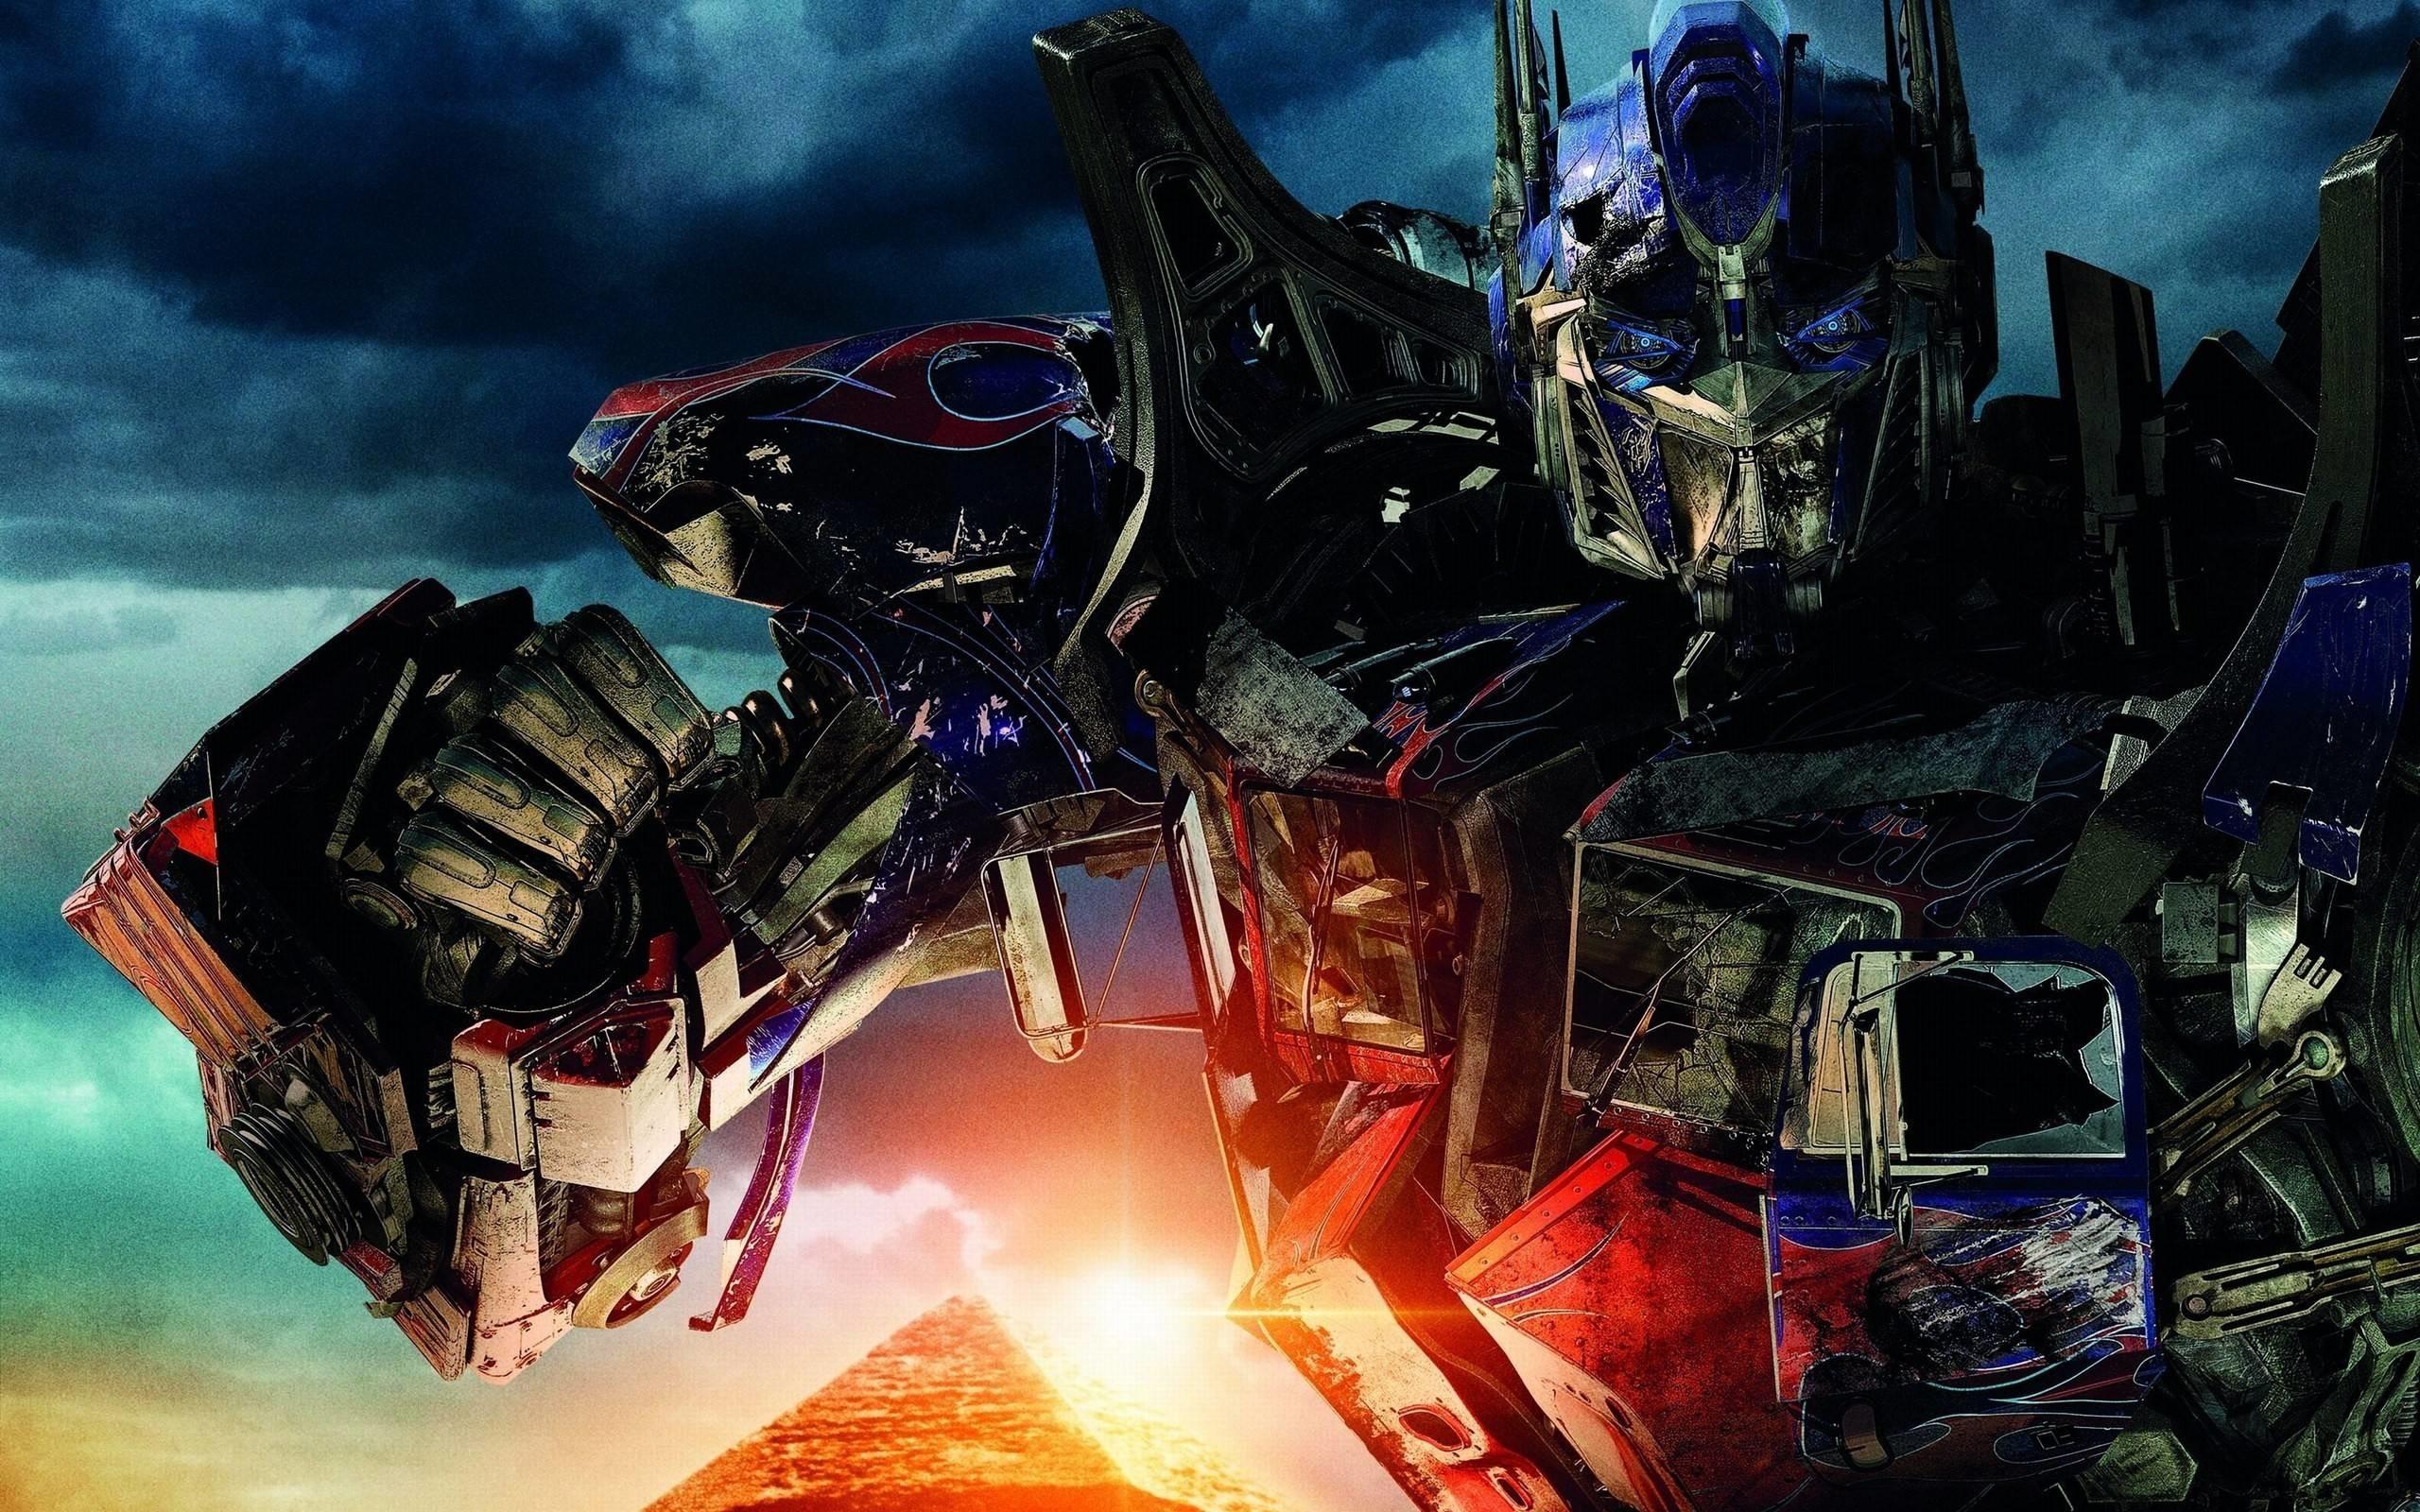 Transformers Wallpaper Hd Widescreen Transformers Desktop Wallpaper 183 ①